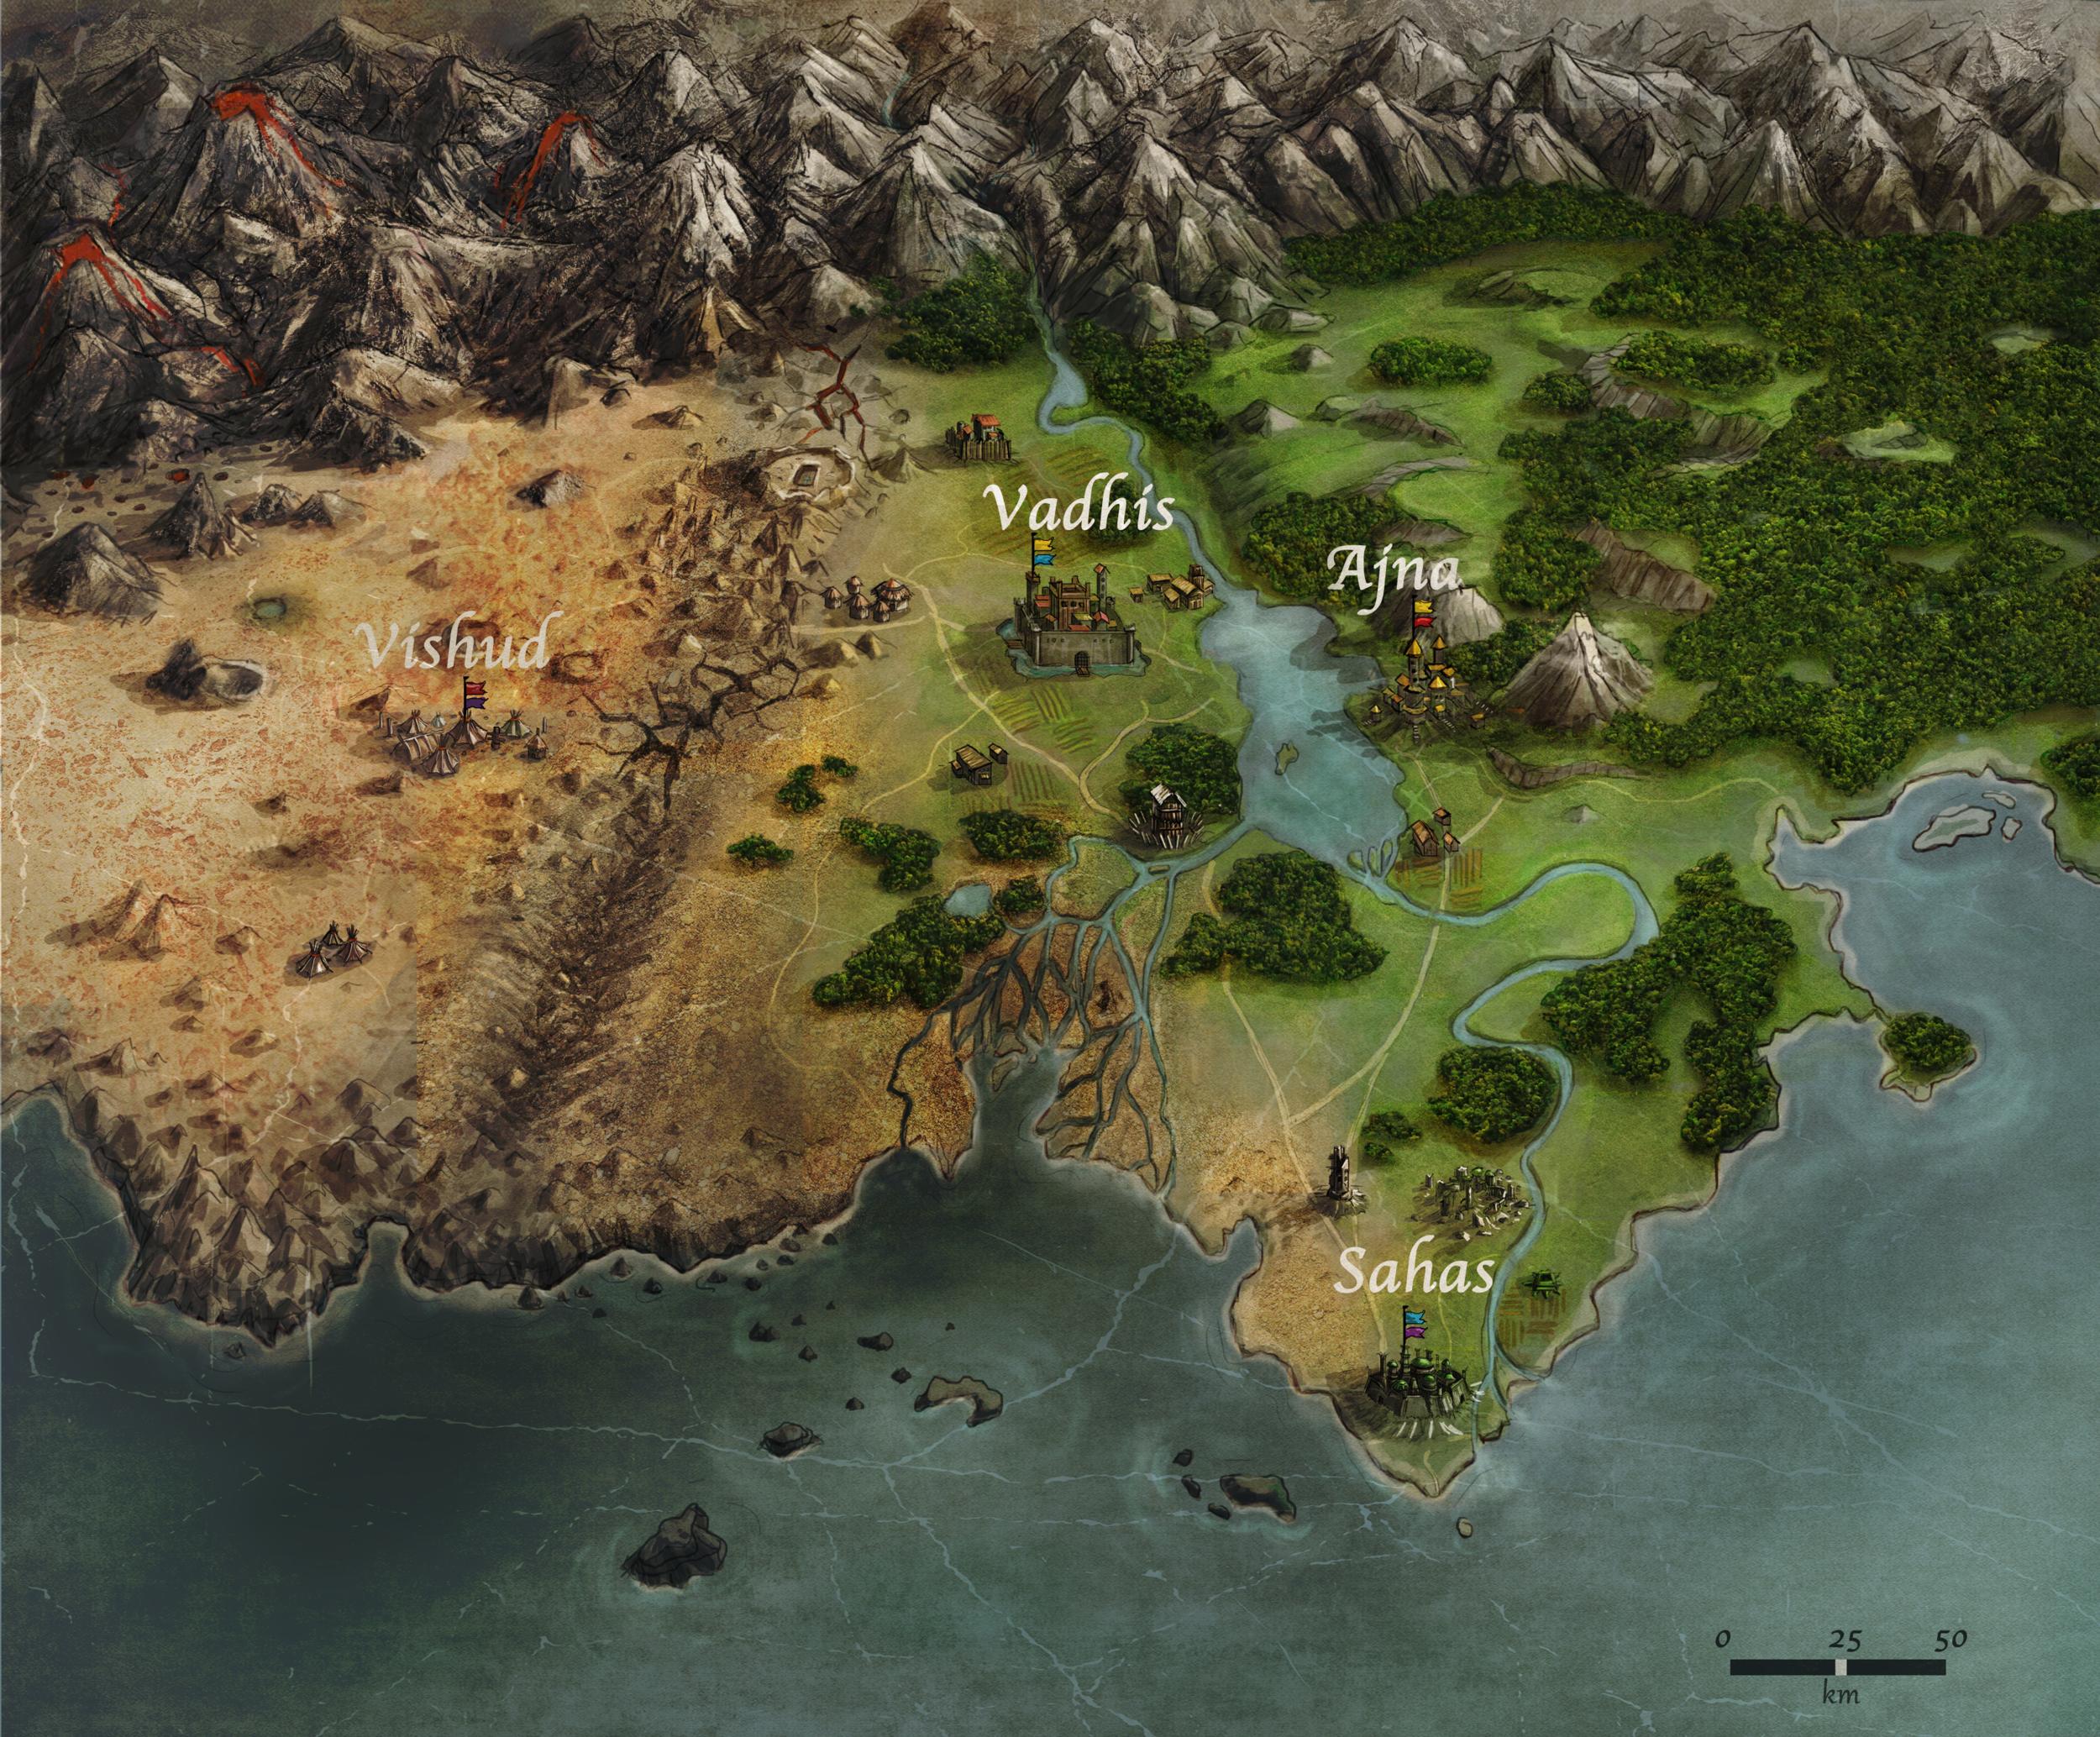 The map of Jaelara